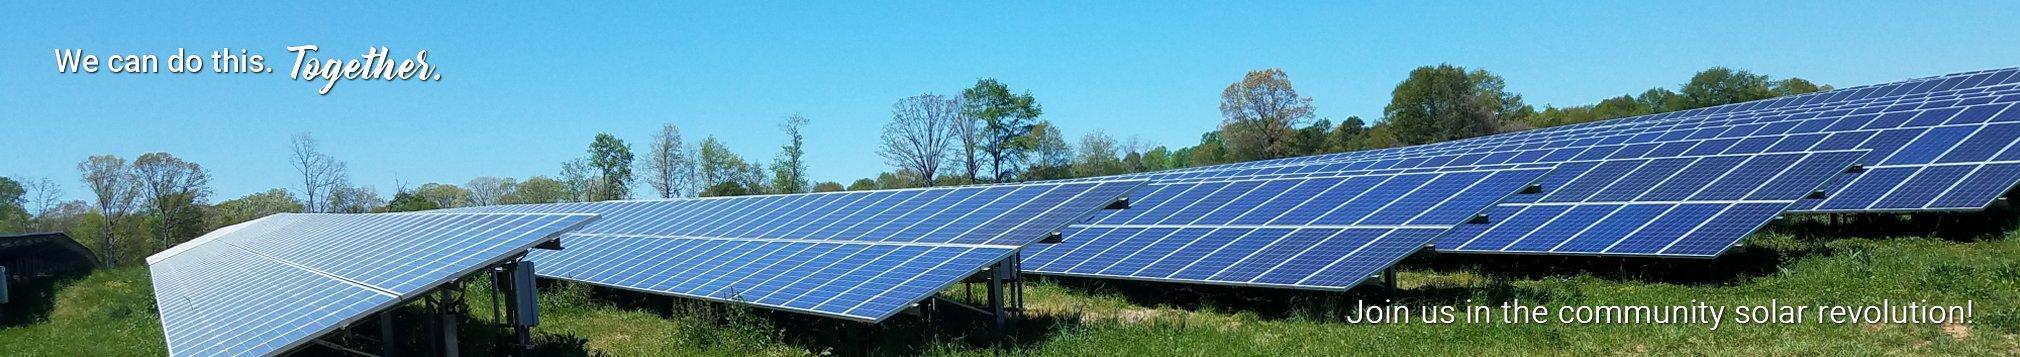 Join us in the community solar revolution!